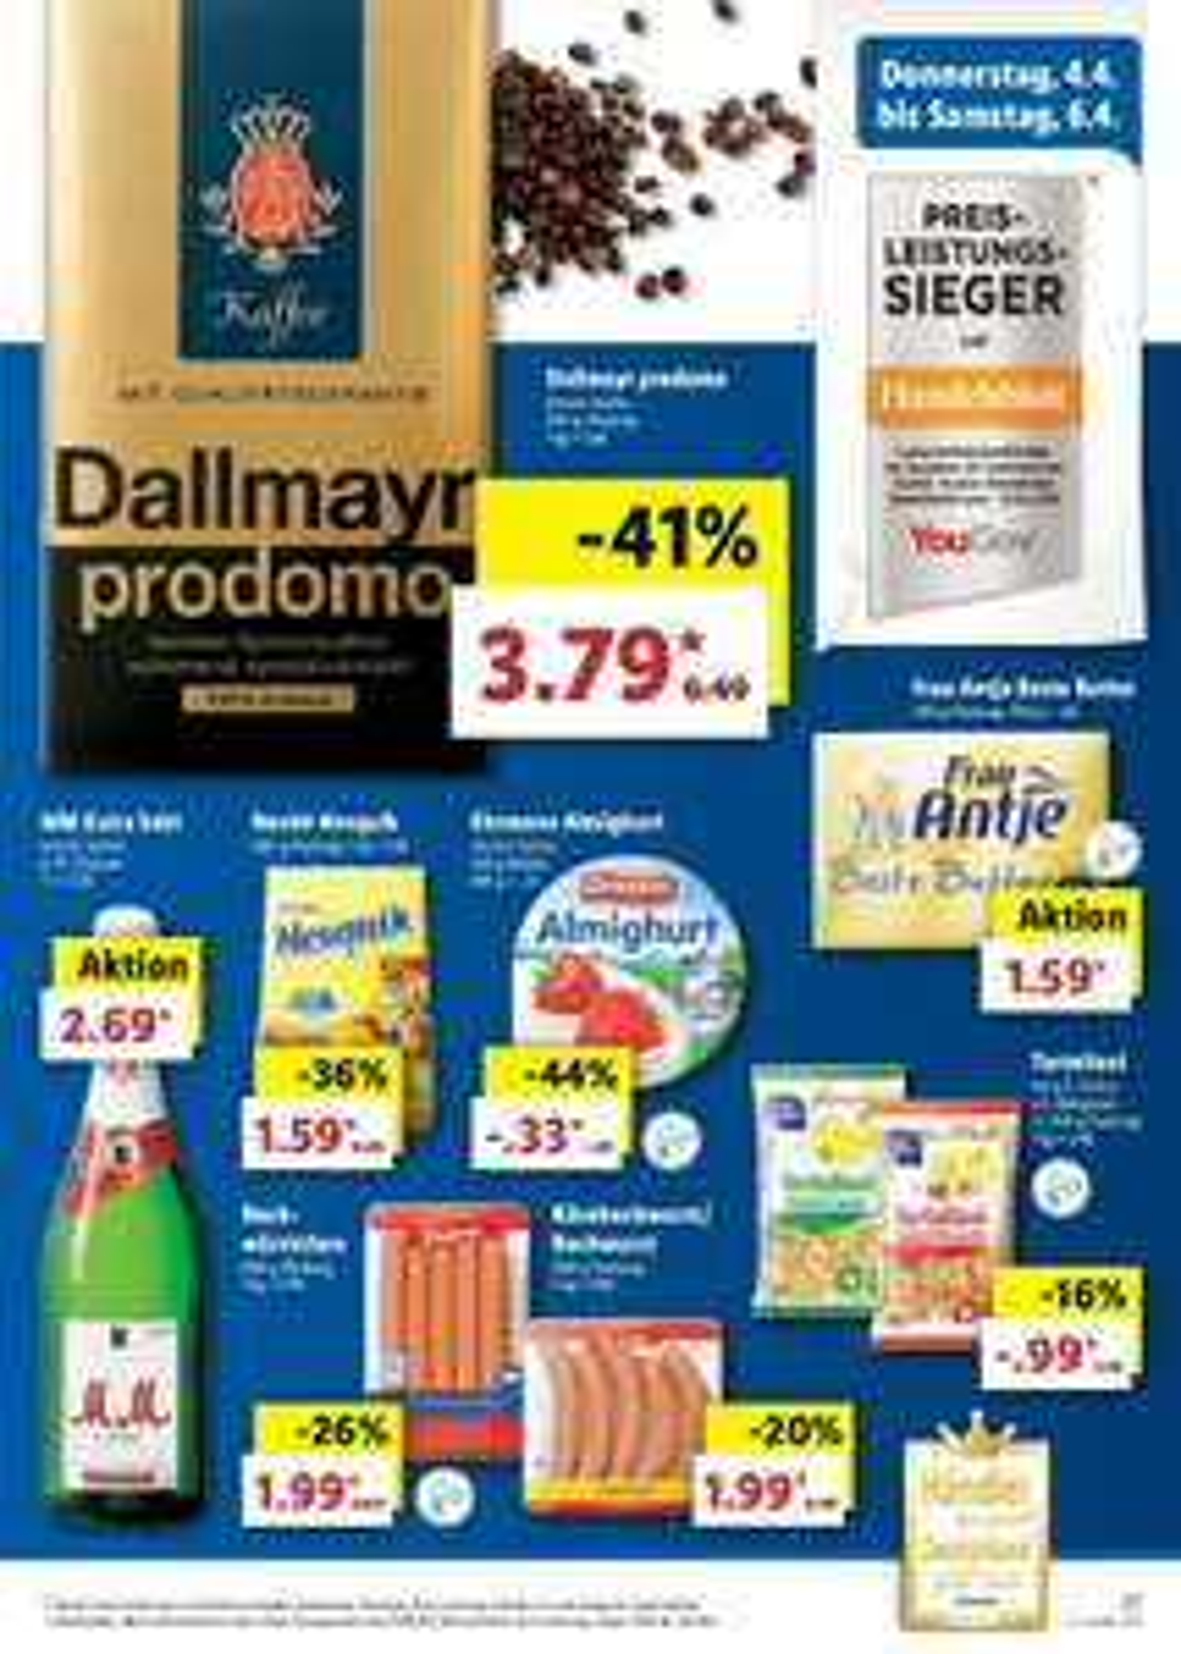 Lidl-Wochenangebot: Kaffee Dallmayr prodomo (500g) für 3,79€